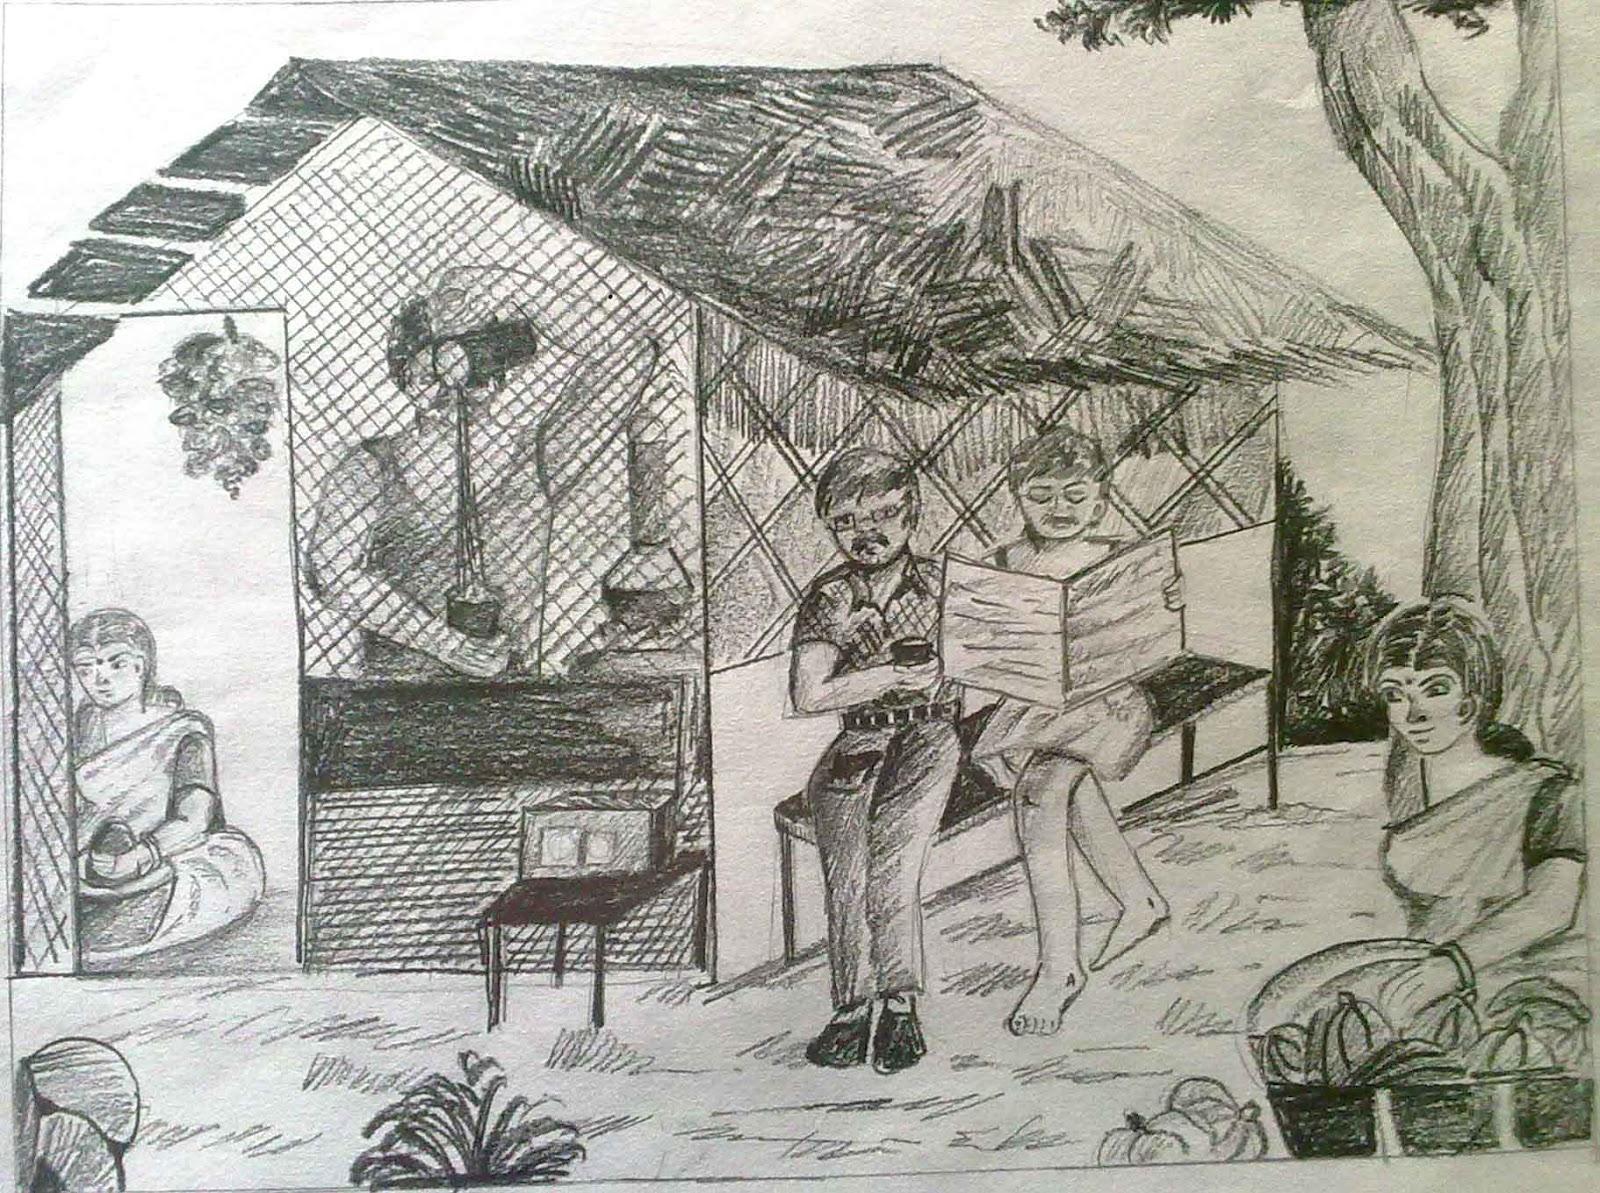 Vpkmmhss puthur pallikkal pencil drawing competition